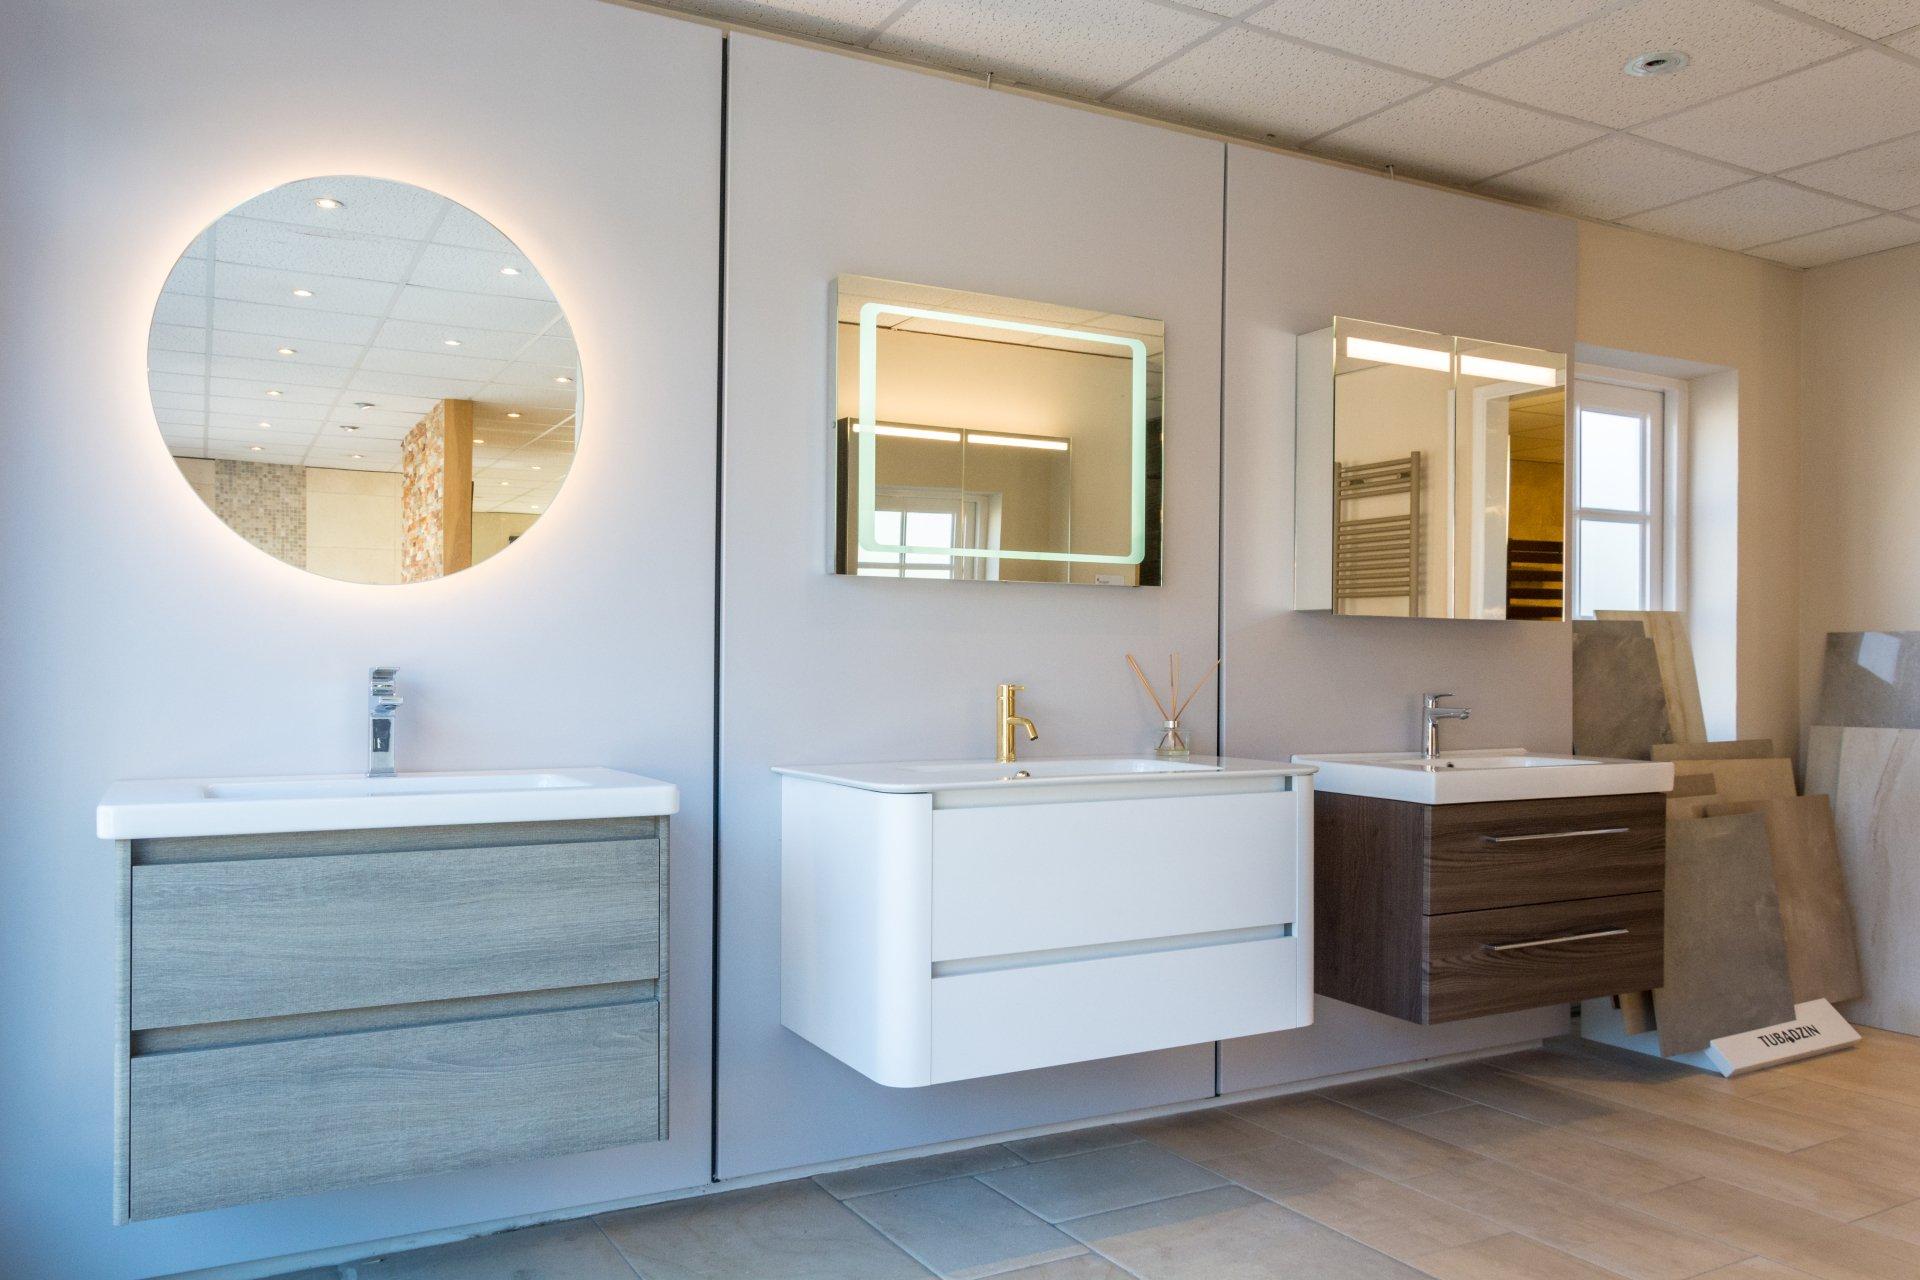 About Options Bath Tile Showroom Ascot Berkshire